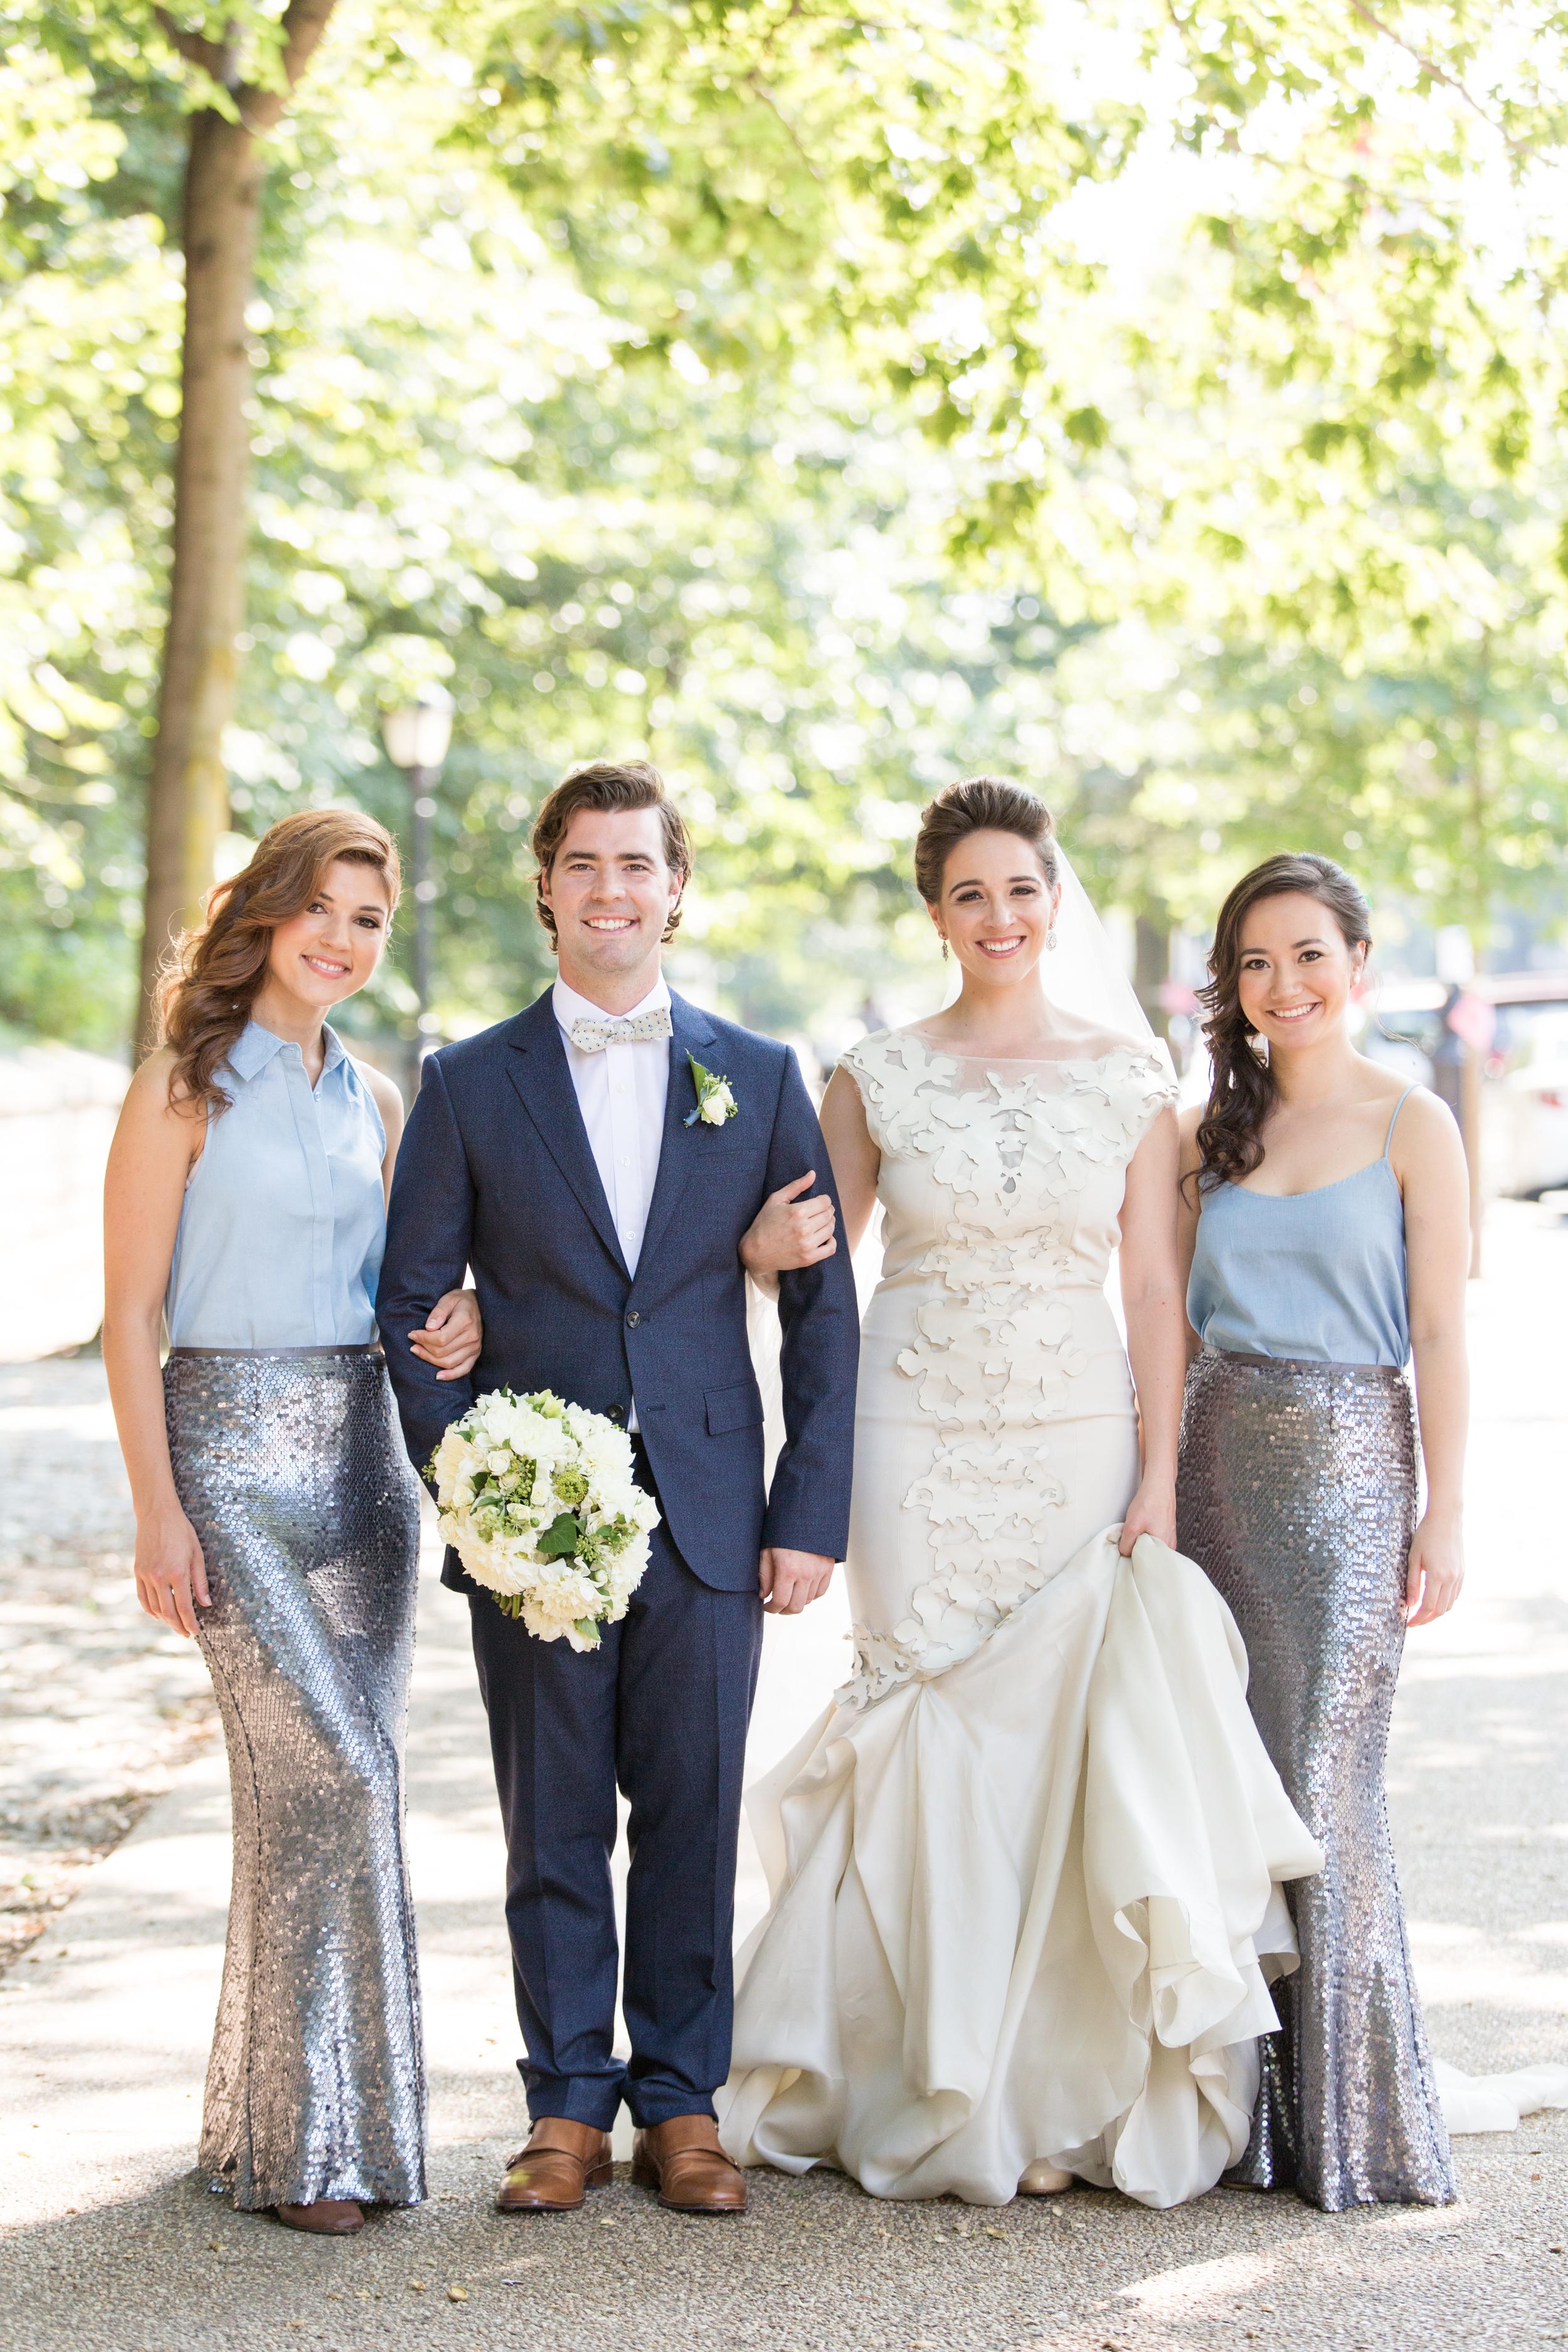 hannah_shih_hanaluluco_cj_isaac_charlie_juliet_ombre_chambray_prospect_park_brooklyn_wedding_17.jpg